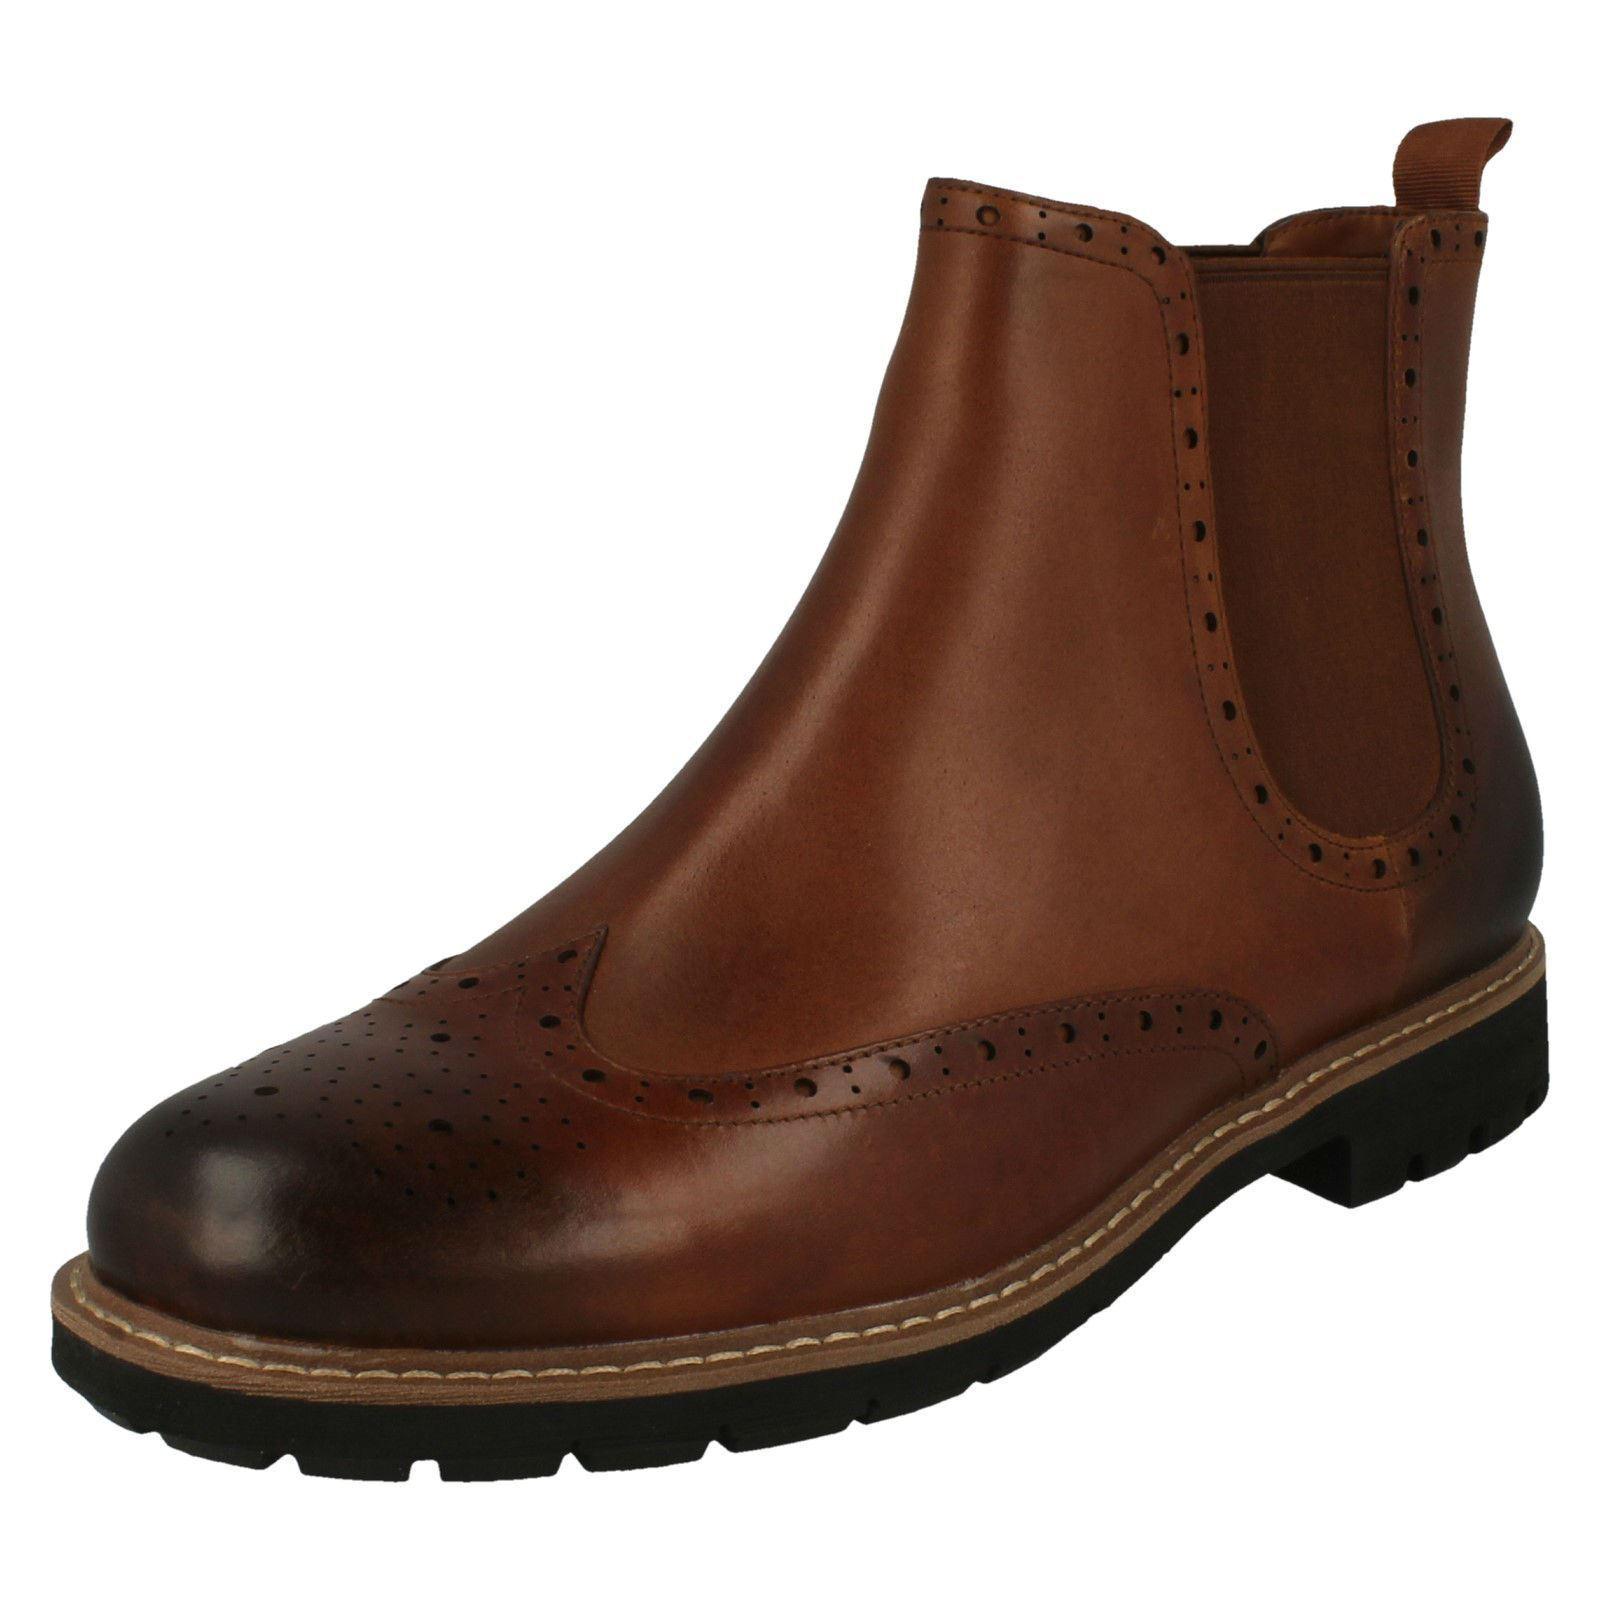 botas para hombre Clarks Smart Chelsea batcombe Top